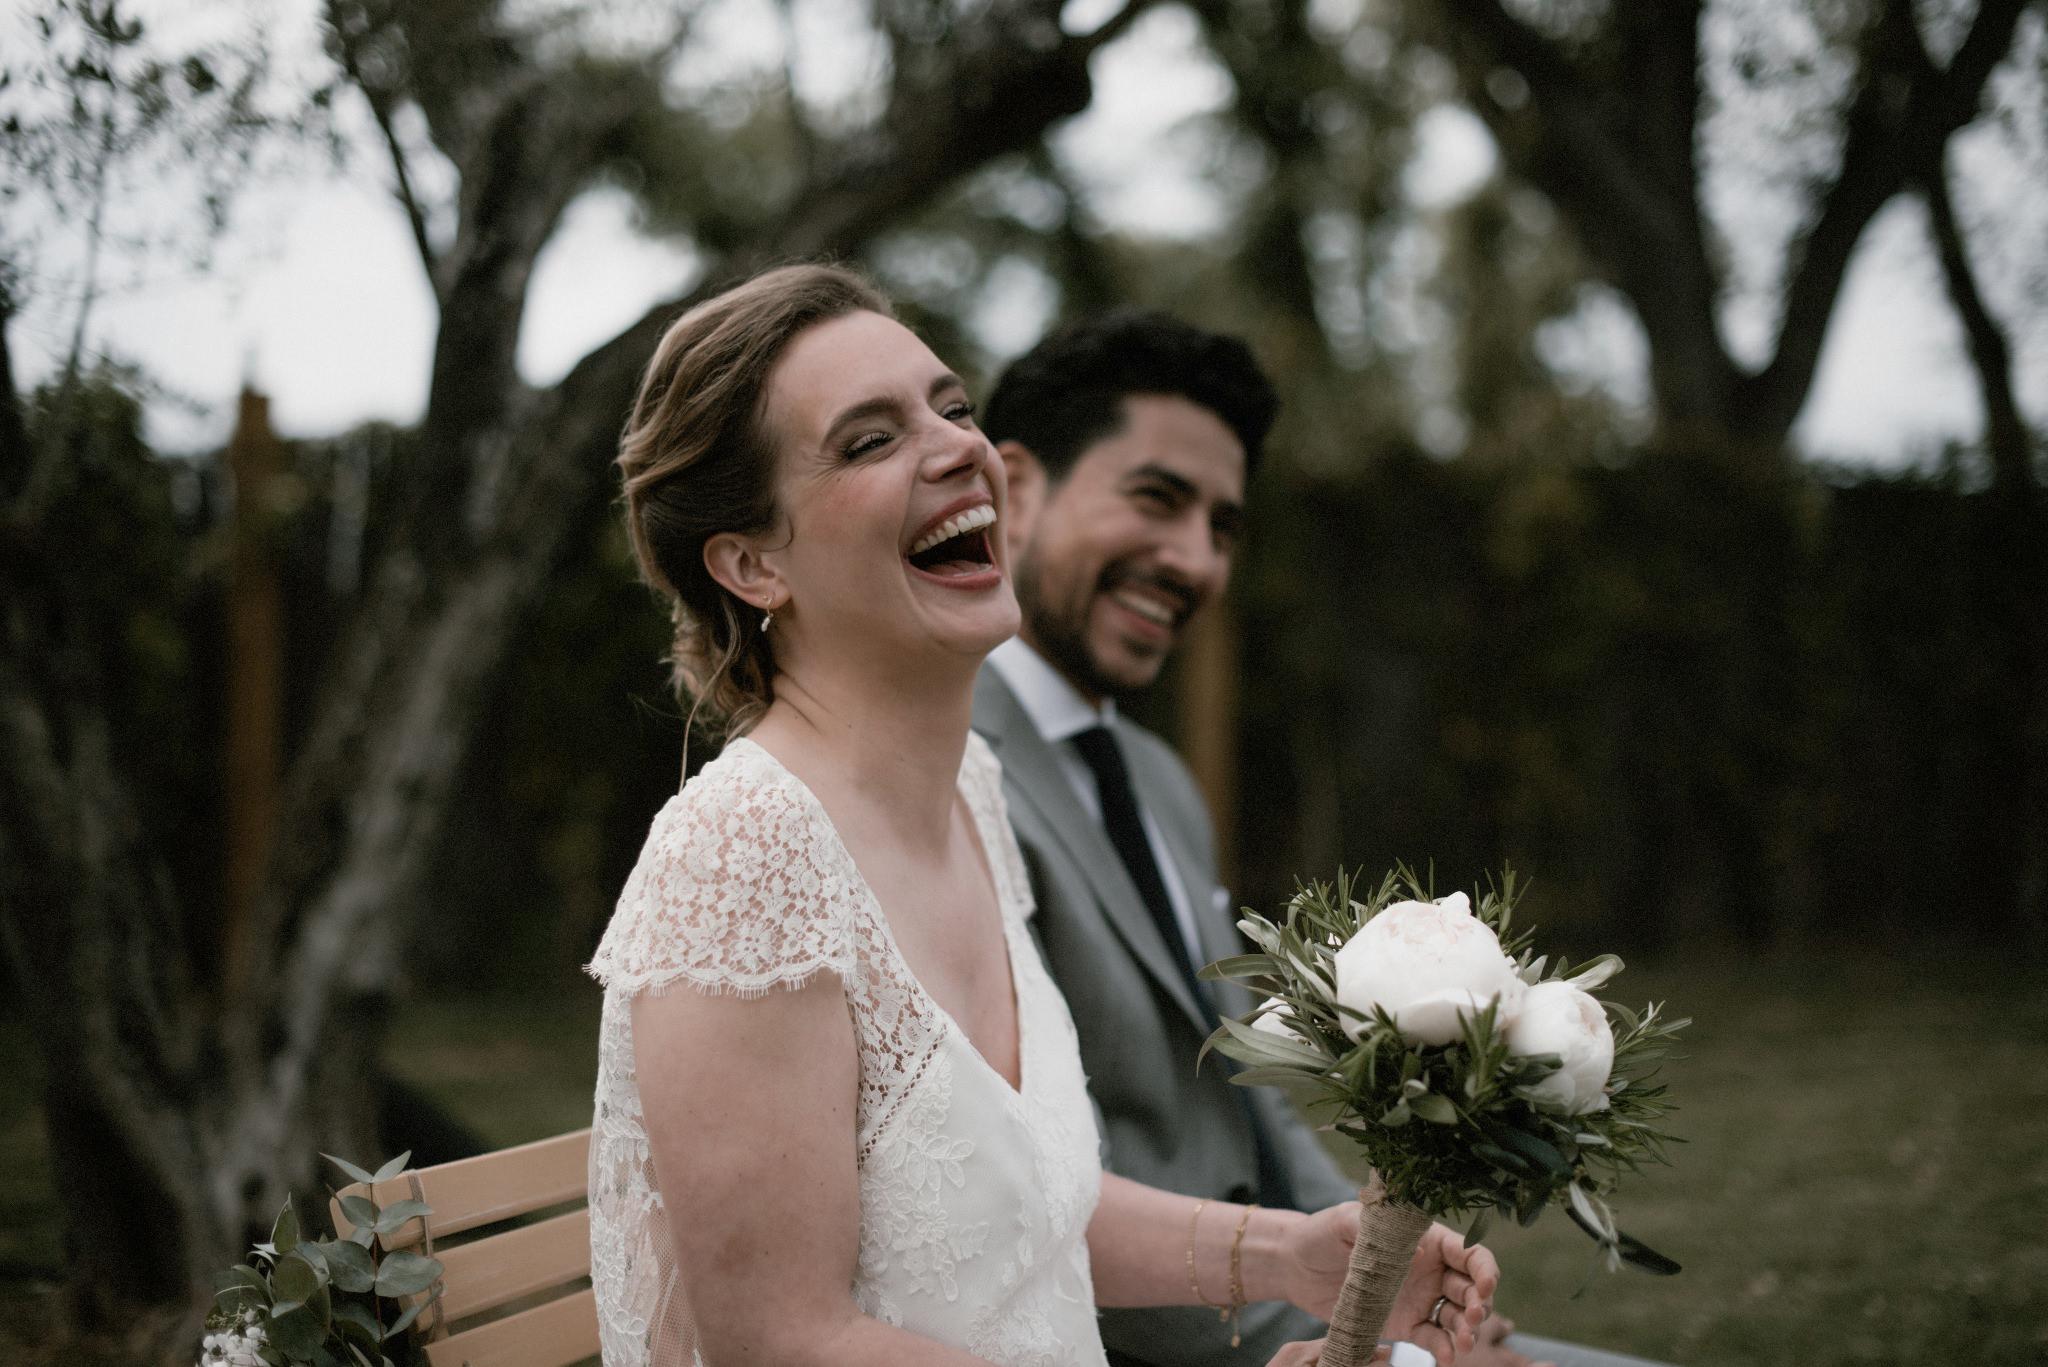 Bruidsfotograaf Spanje Castle d'Emporda destination wedding Naomi van der Kraan00036.jpg